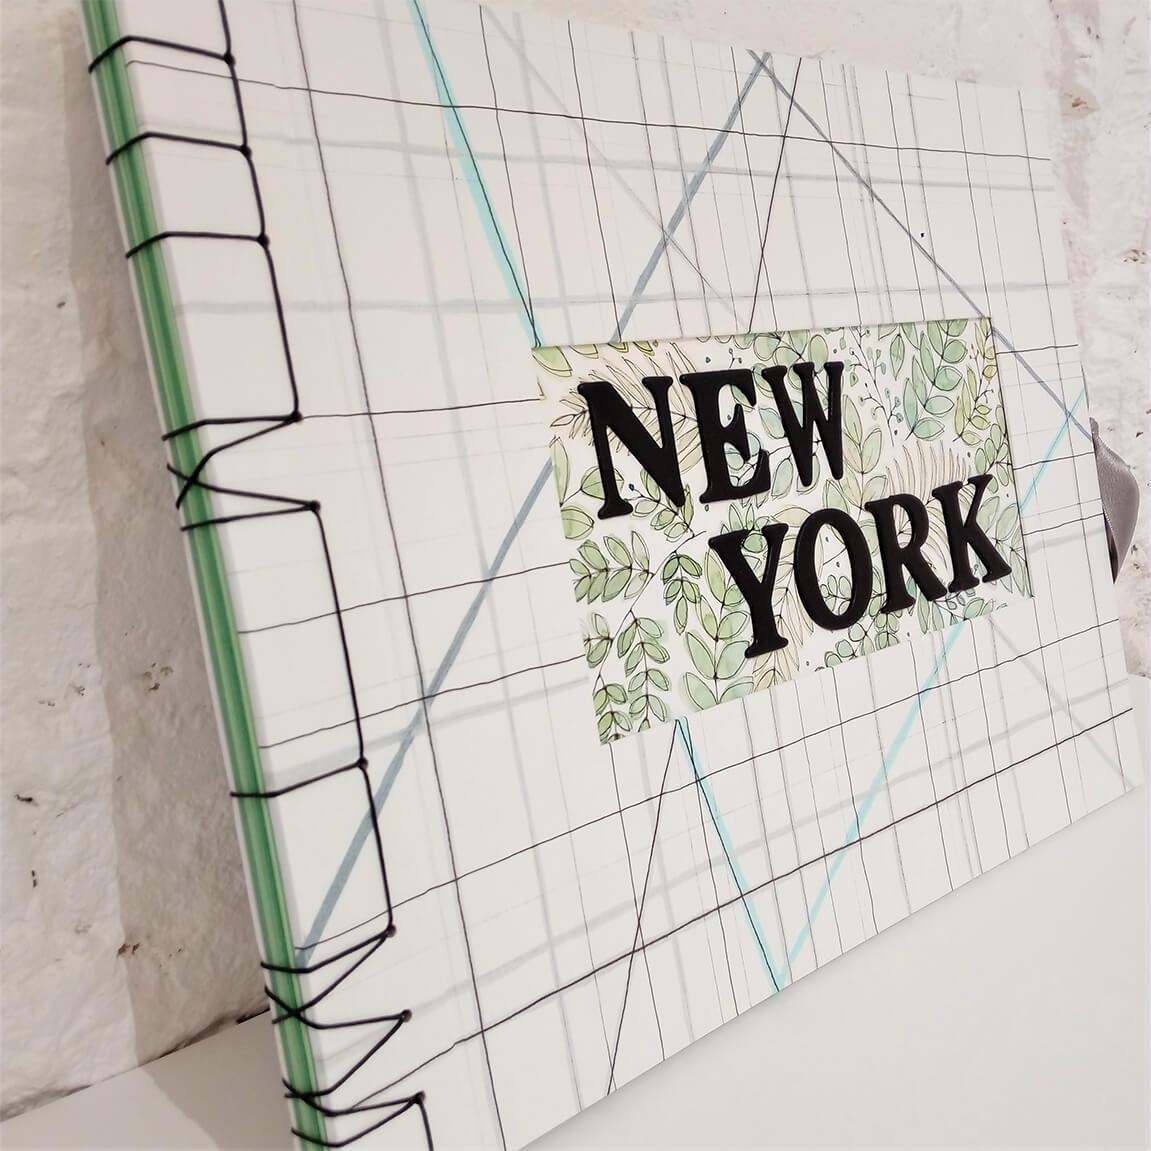 Àlbum japonès New York